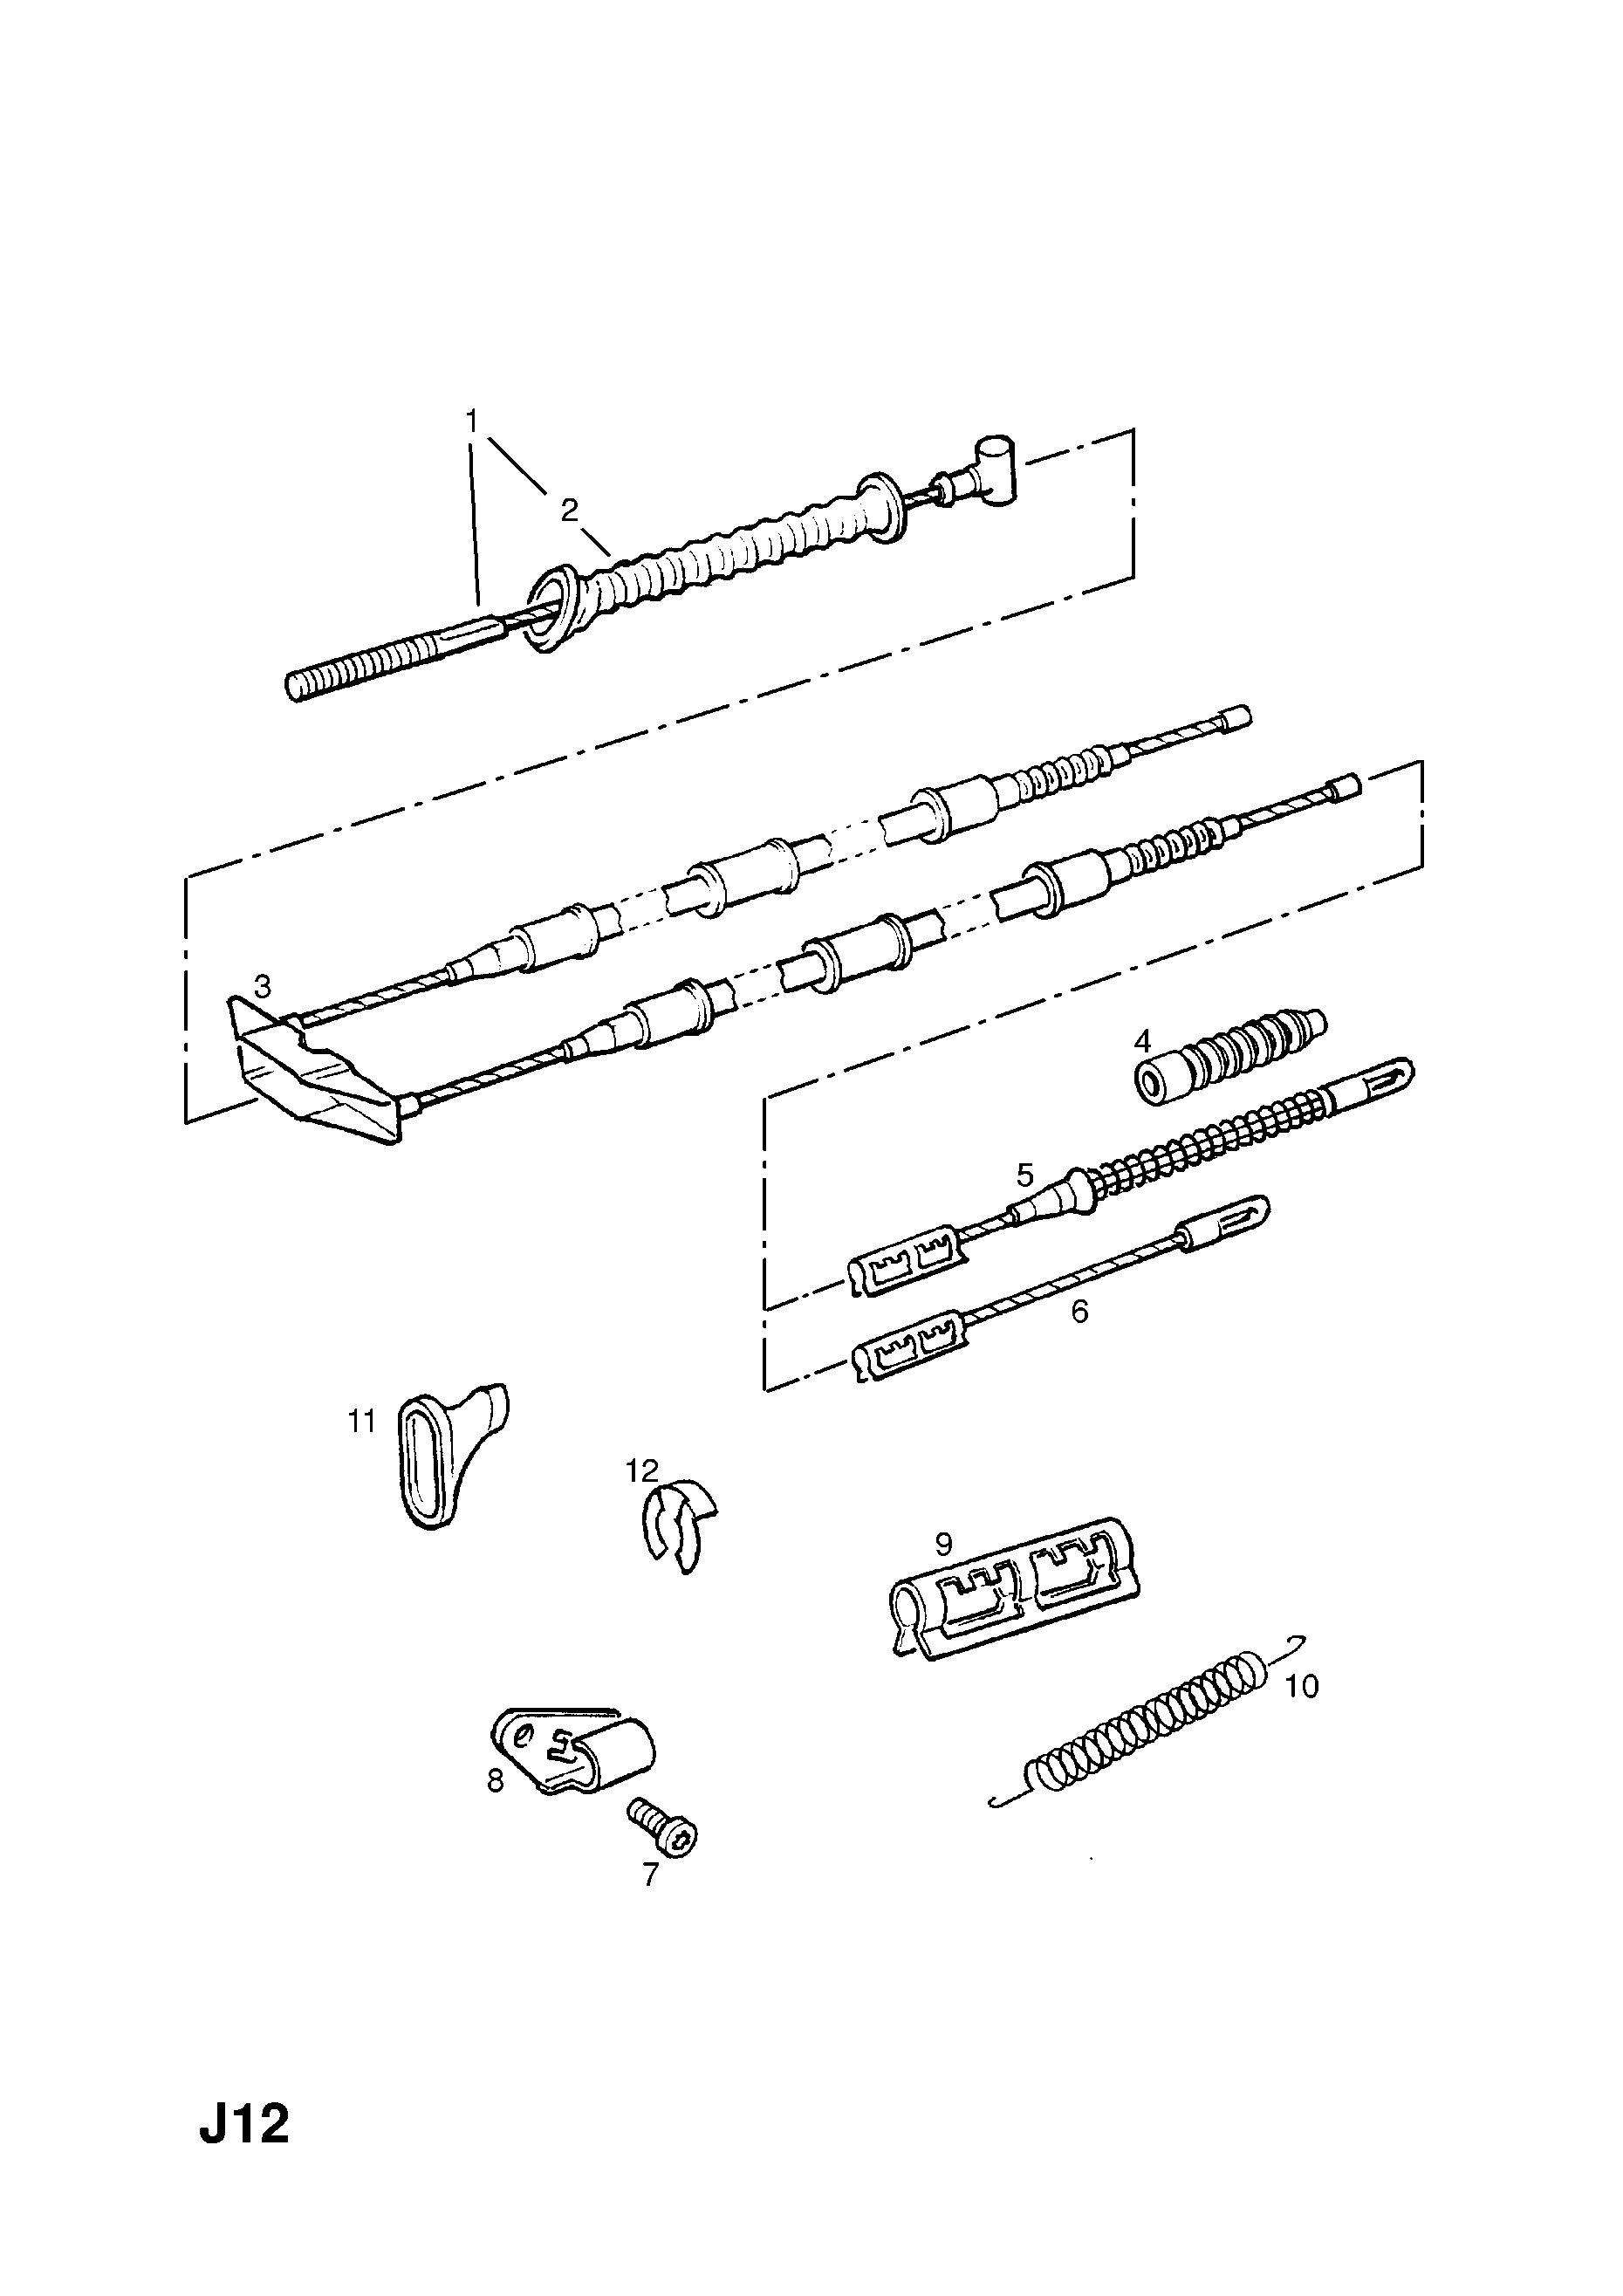 vauxhall vectra spare parts catalogue